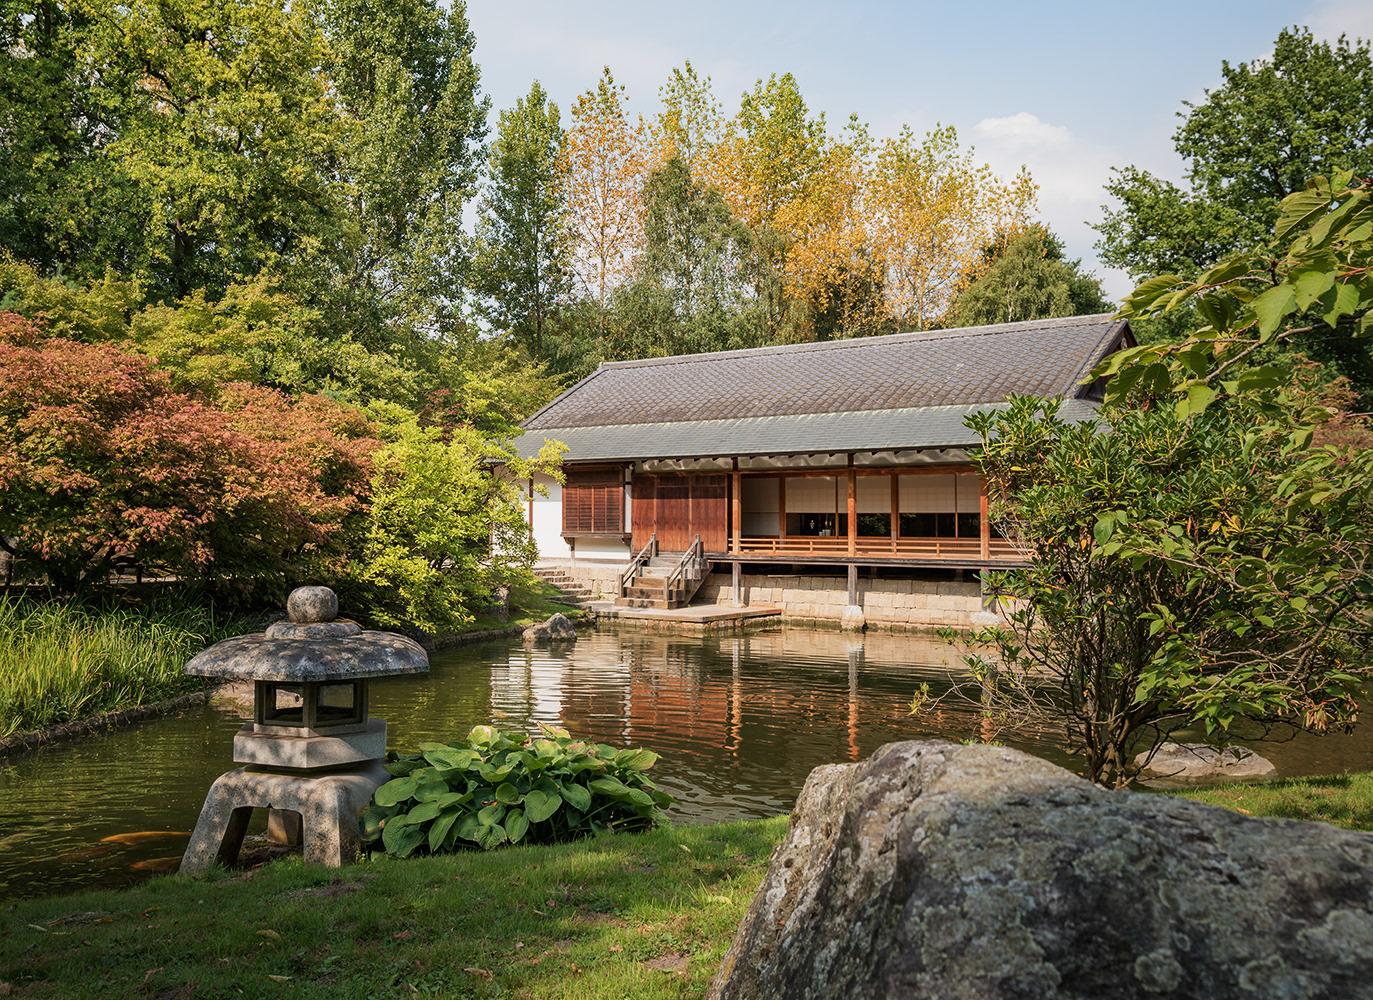 Dieter Jehs - Travel: The Japanese Garden